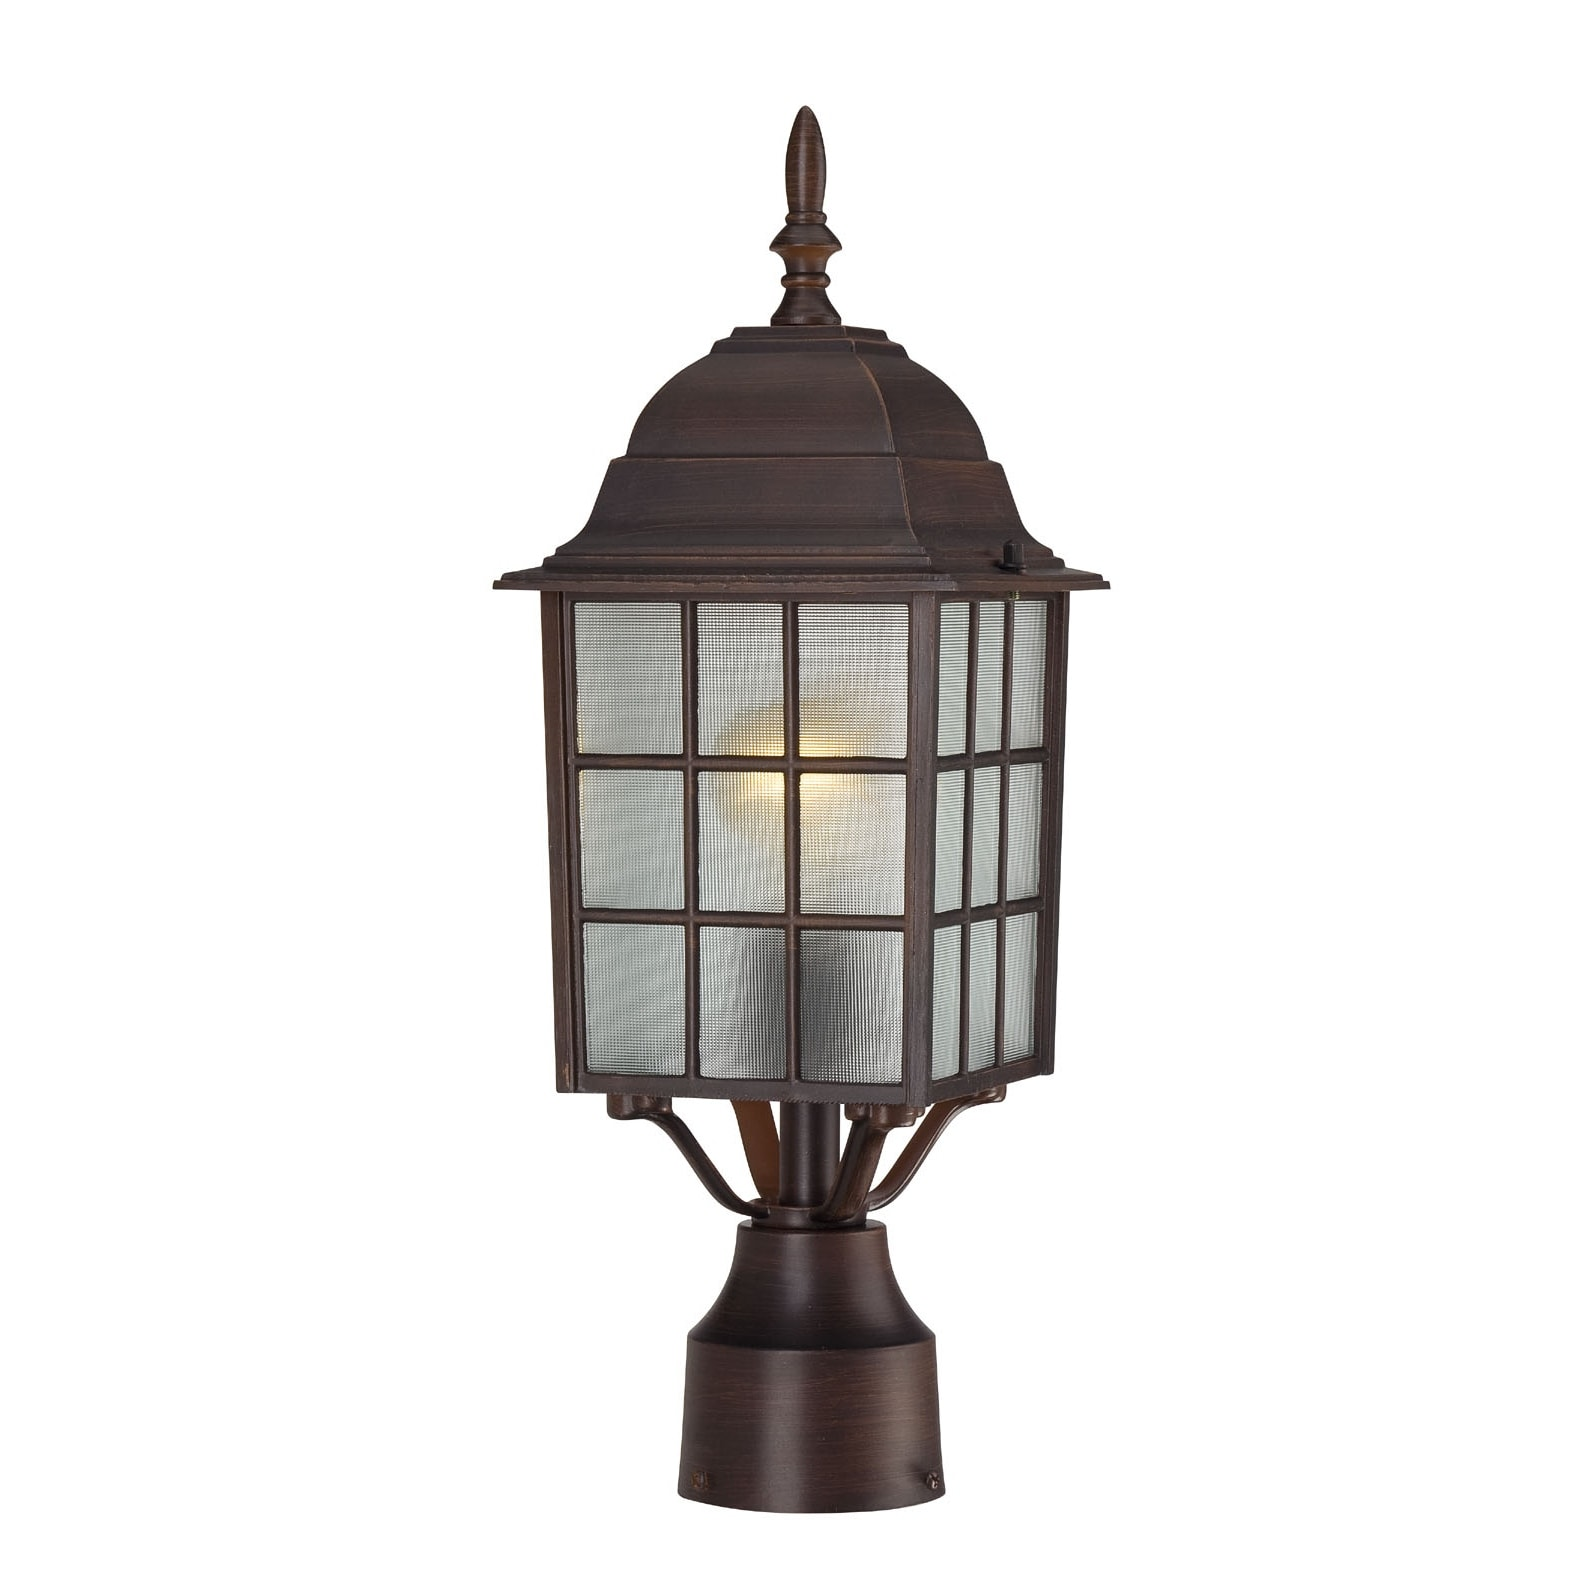 Rustic Outdoor Lighting Lantern